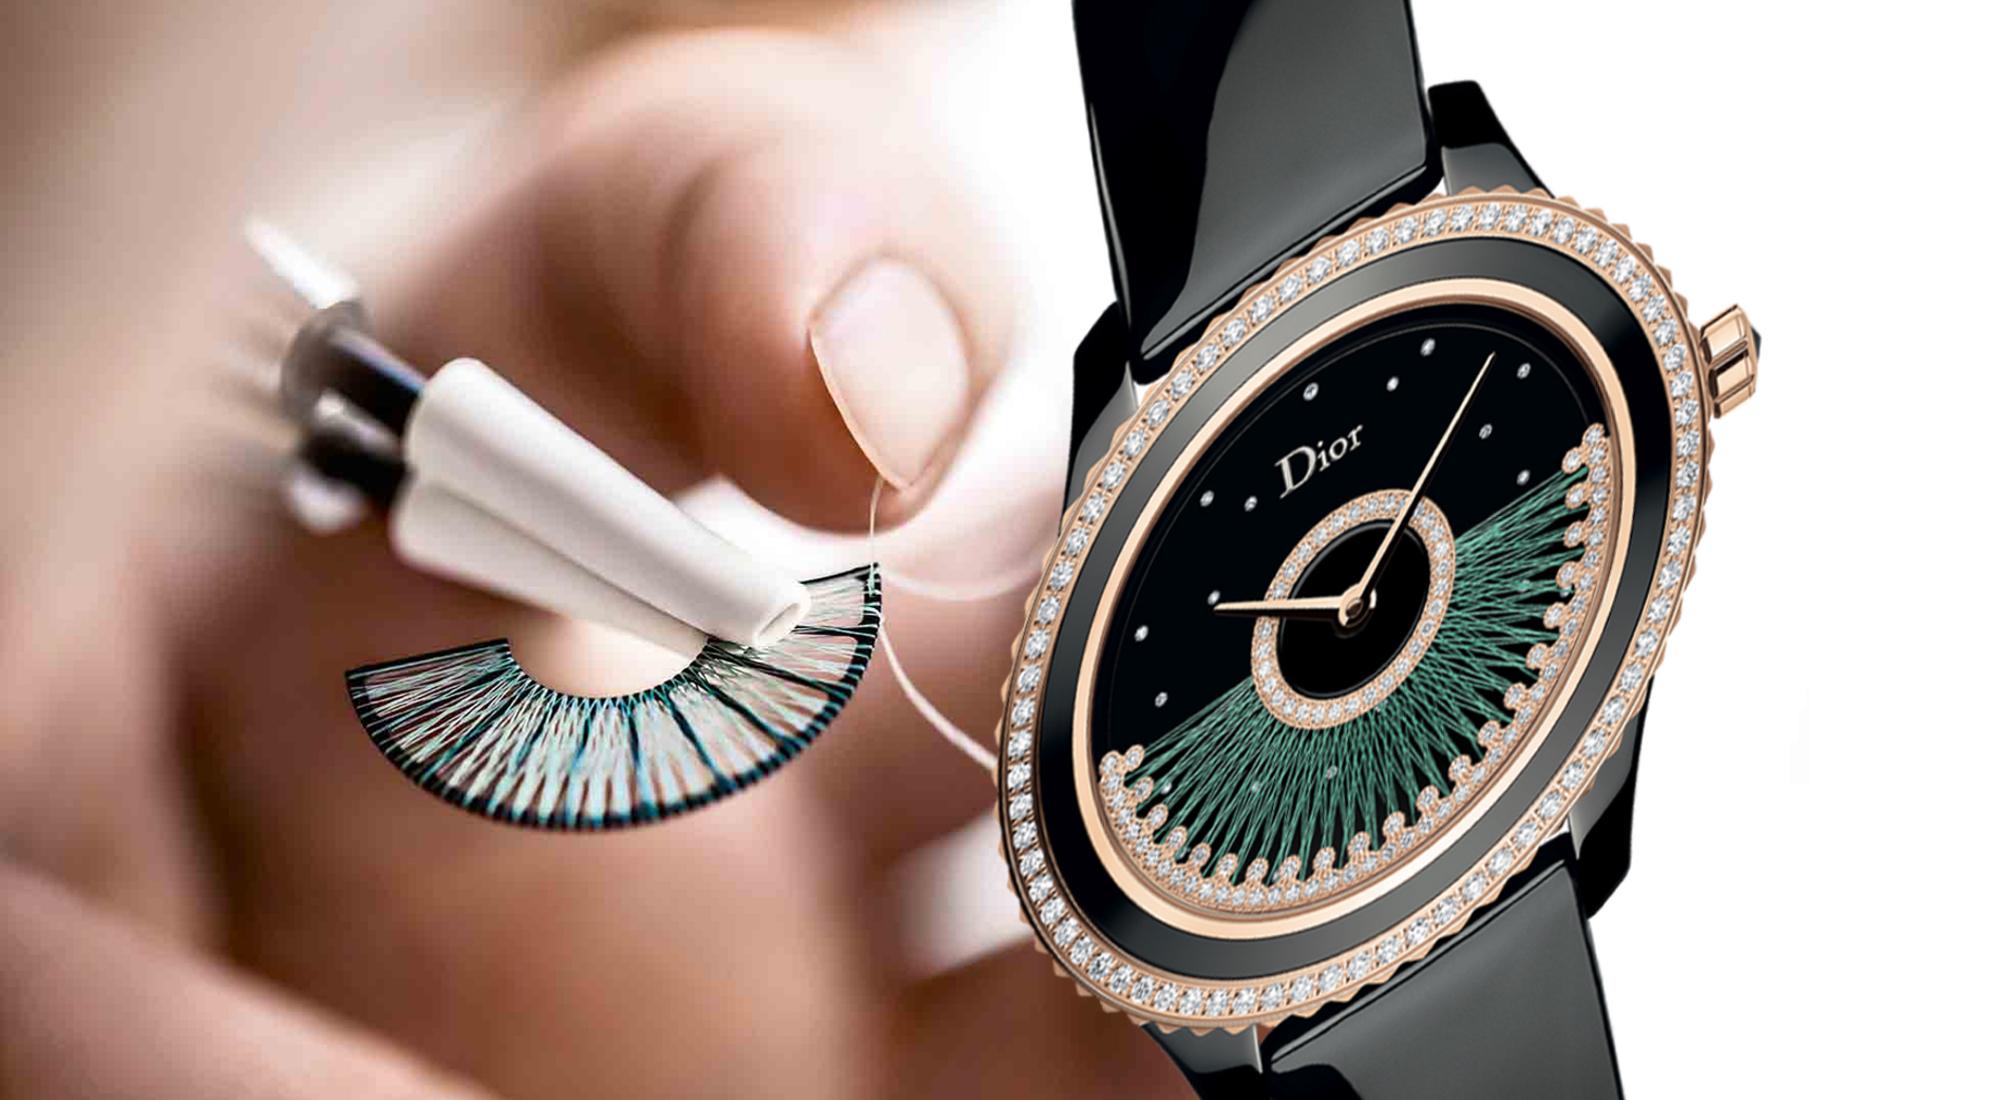 038607672 DIOR تناقض جميل - عالم الساعات و المجوهرات